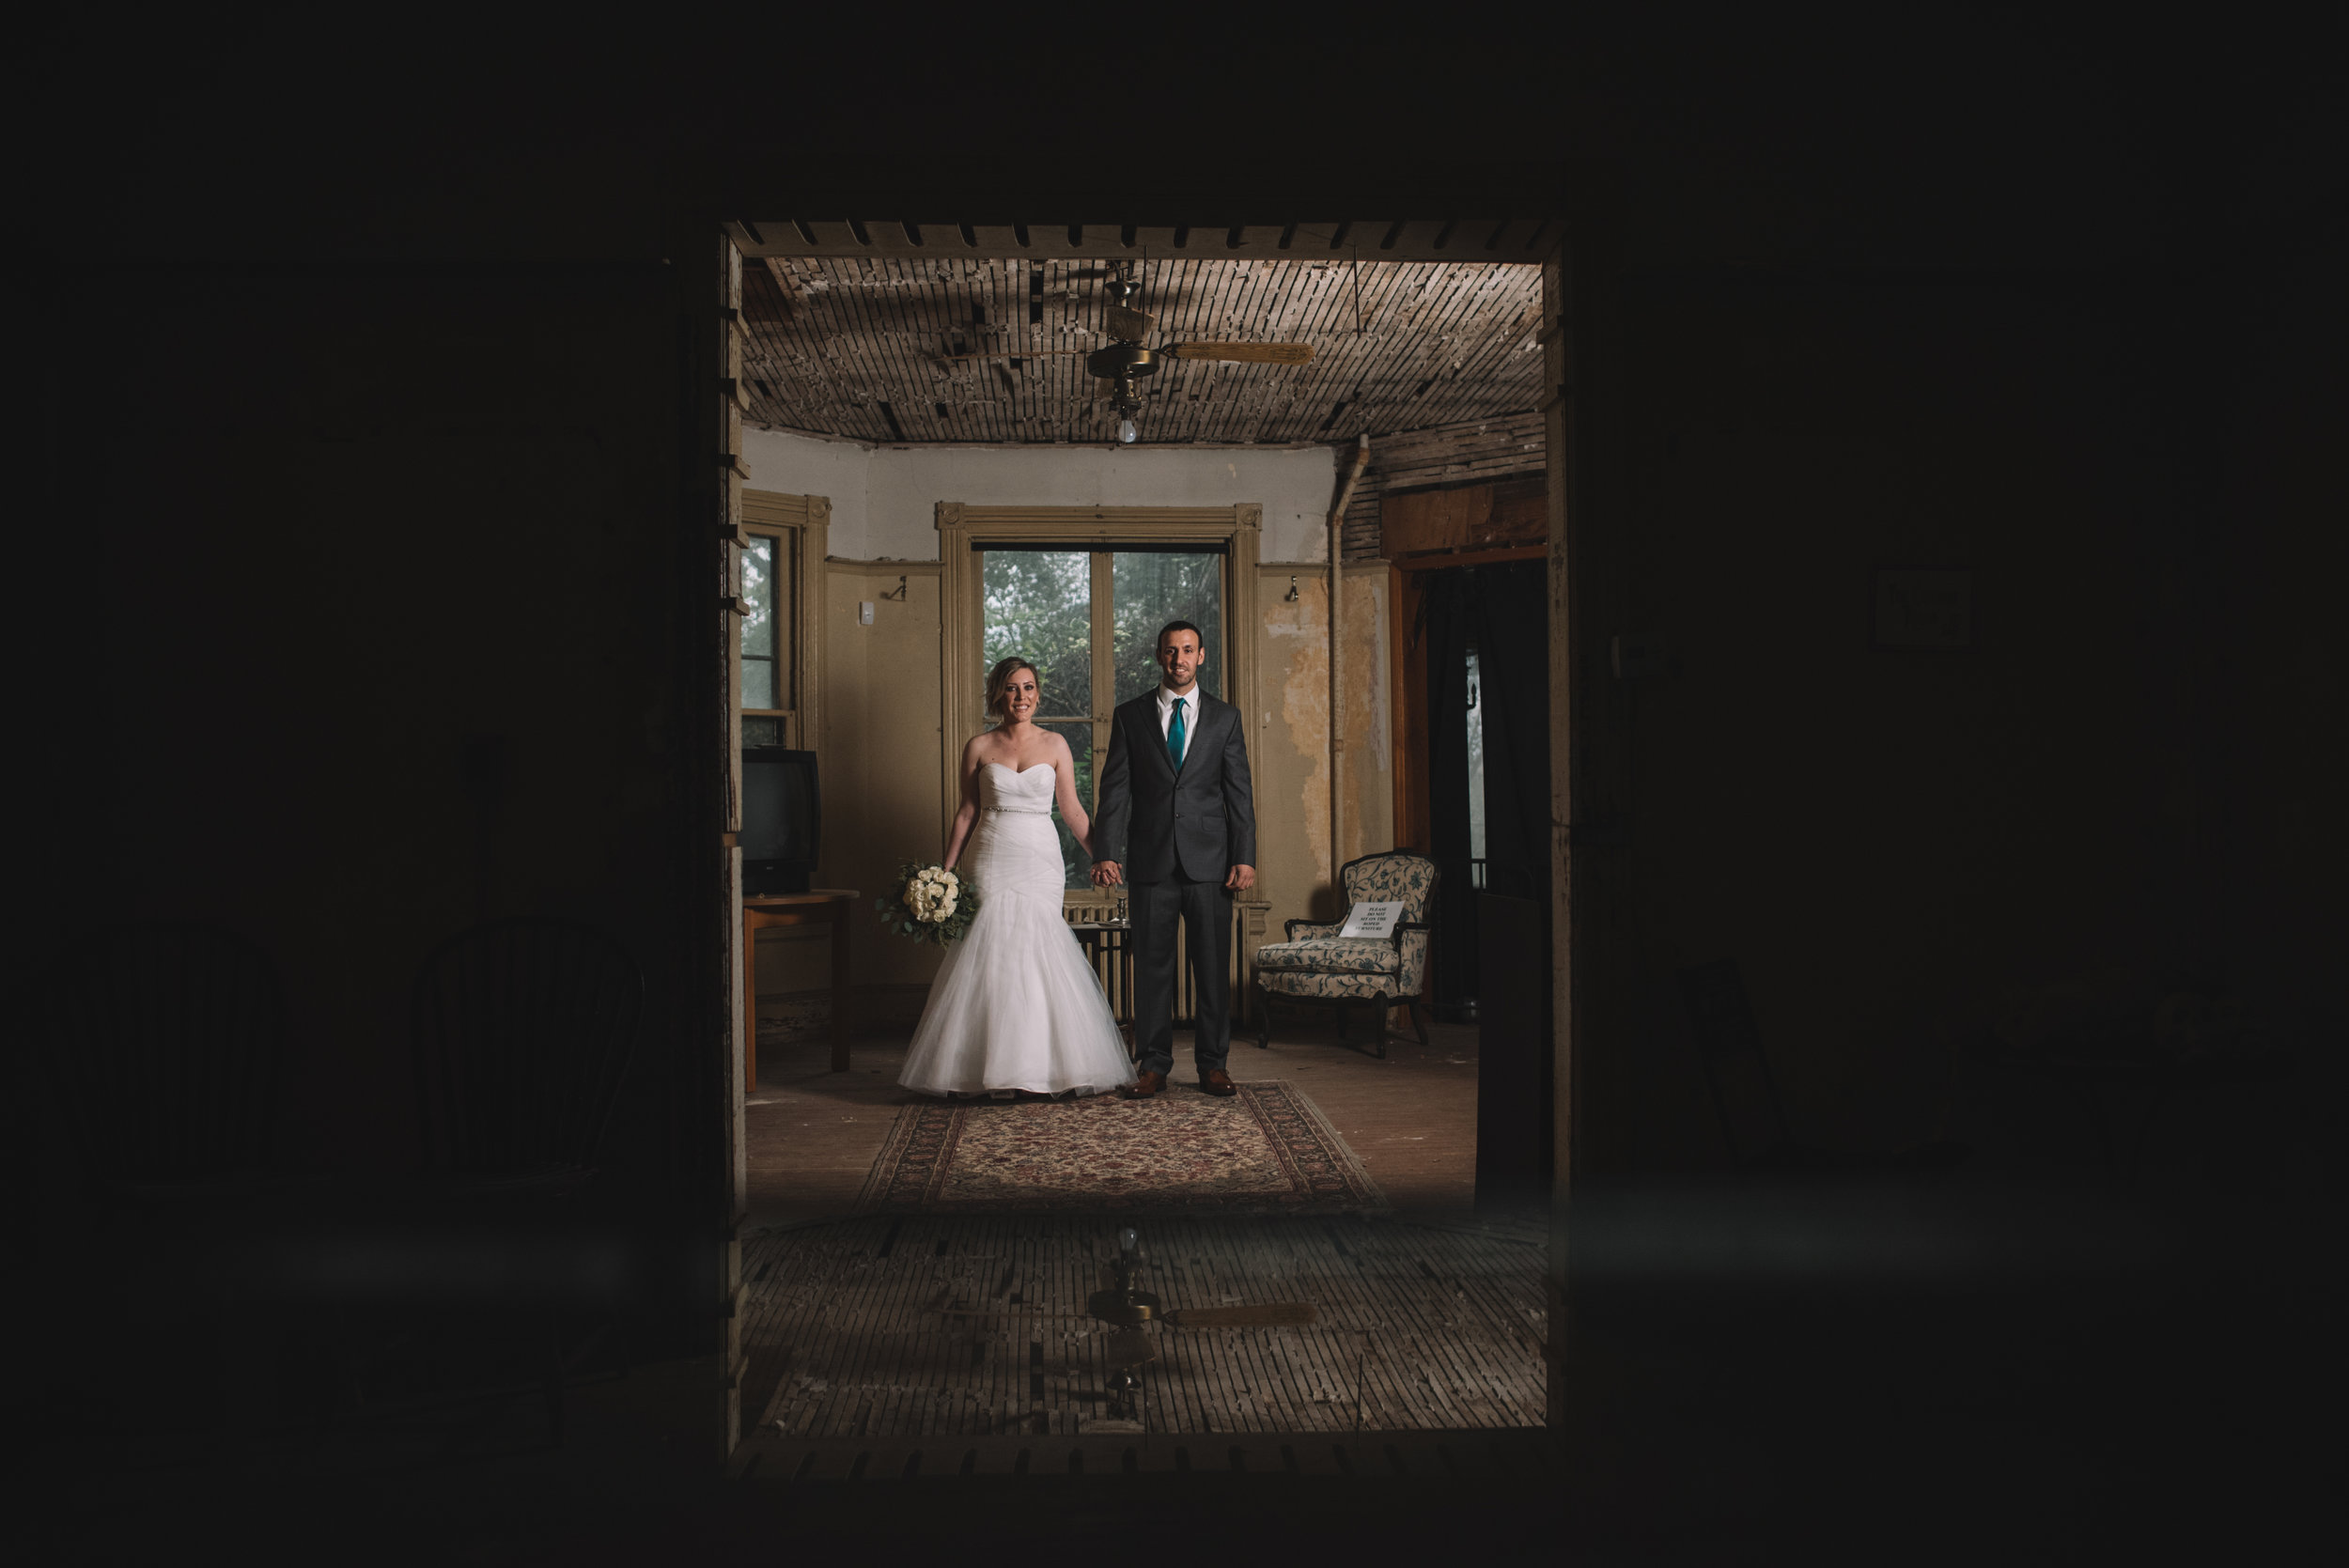 WeddingPhotos | NJPhotographer | Highlights-8-28.jpg